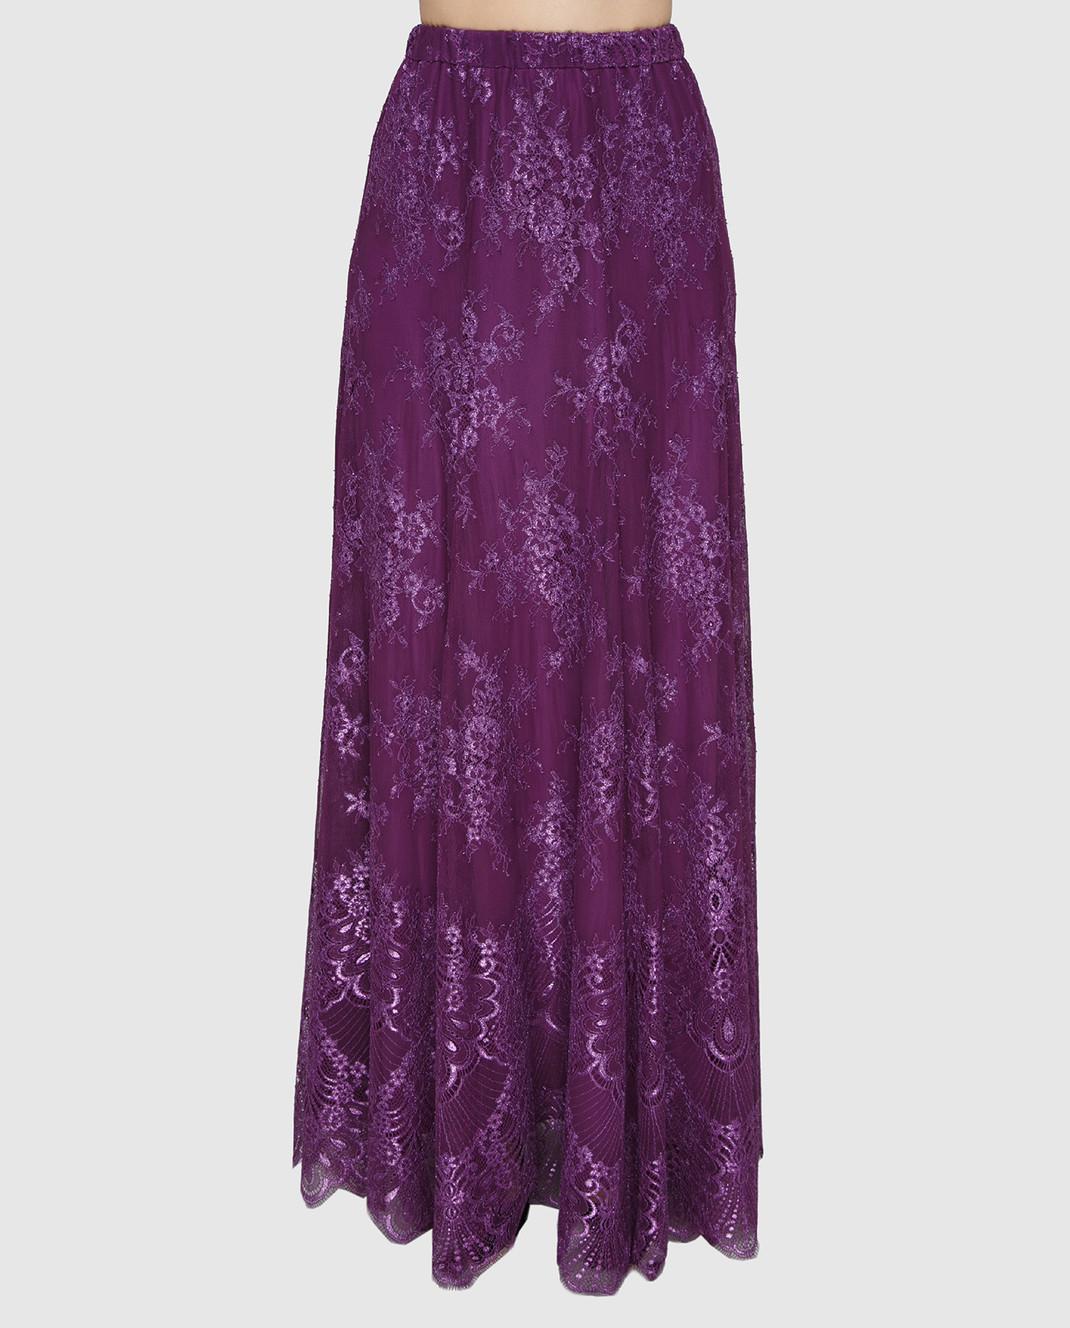 Philosophy di Lorenzo Serafini Фиолетовая юбка A0117 изображение 3